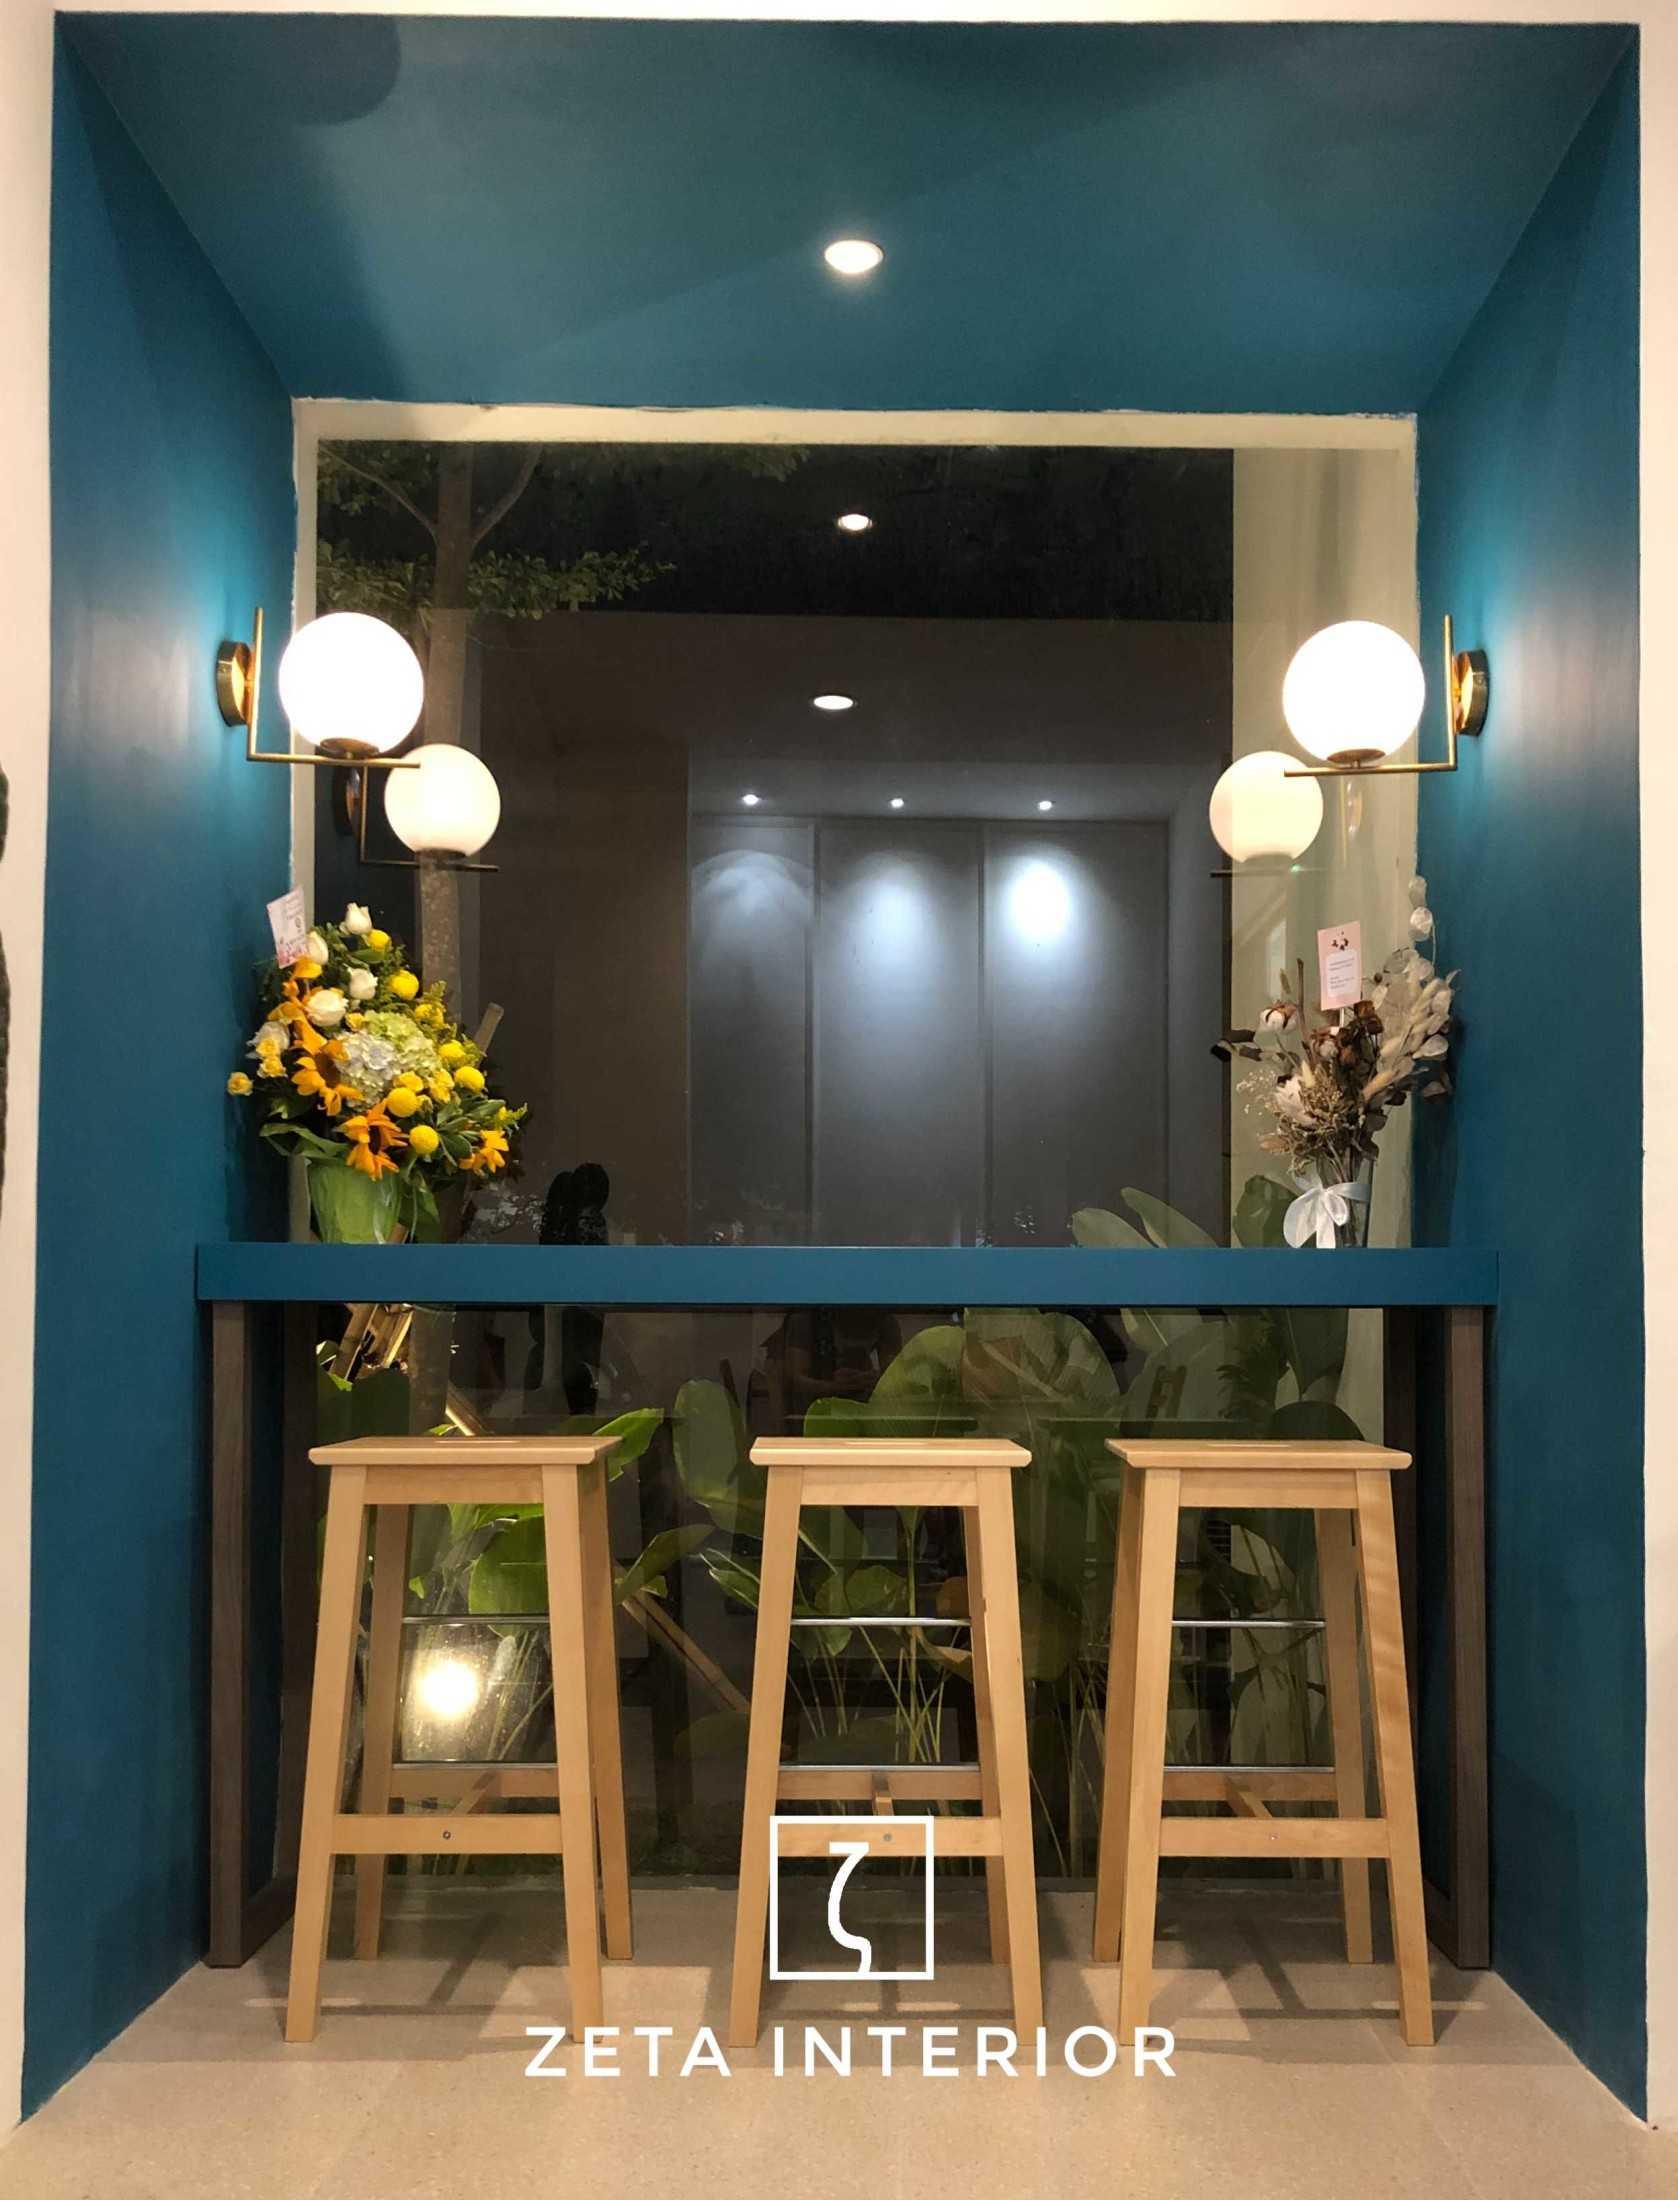 Zeta Interior Design It Bowl Kitchen Surabaya, Kota Sby, Jawa Timur, Indonesia Surabaya, Kota Sby, Jawa Timur, Indonesia Zeta-Interior-Design-It-Bowl-Kitchen  74955